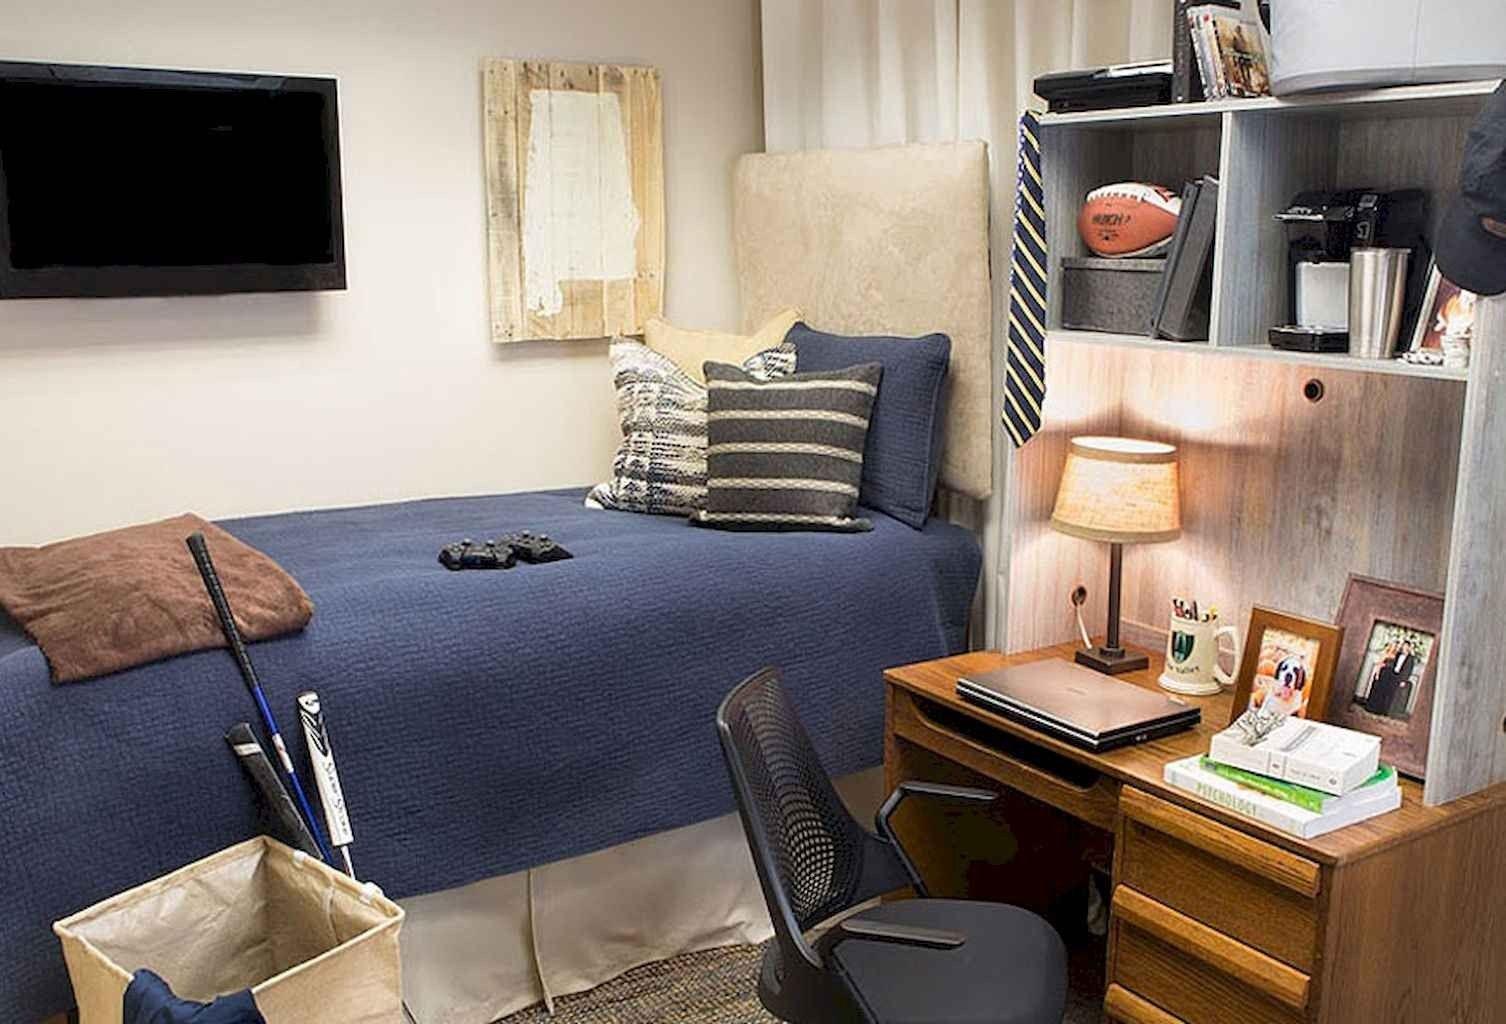 20+Top Efficient Dorm Room Organization Ideas images